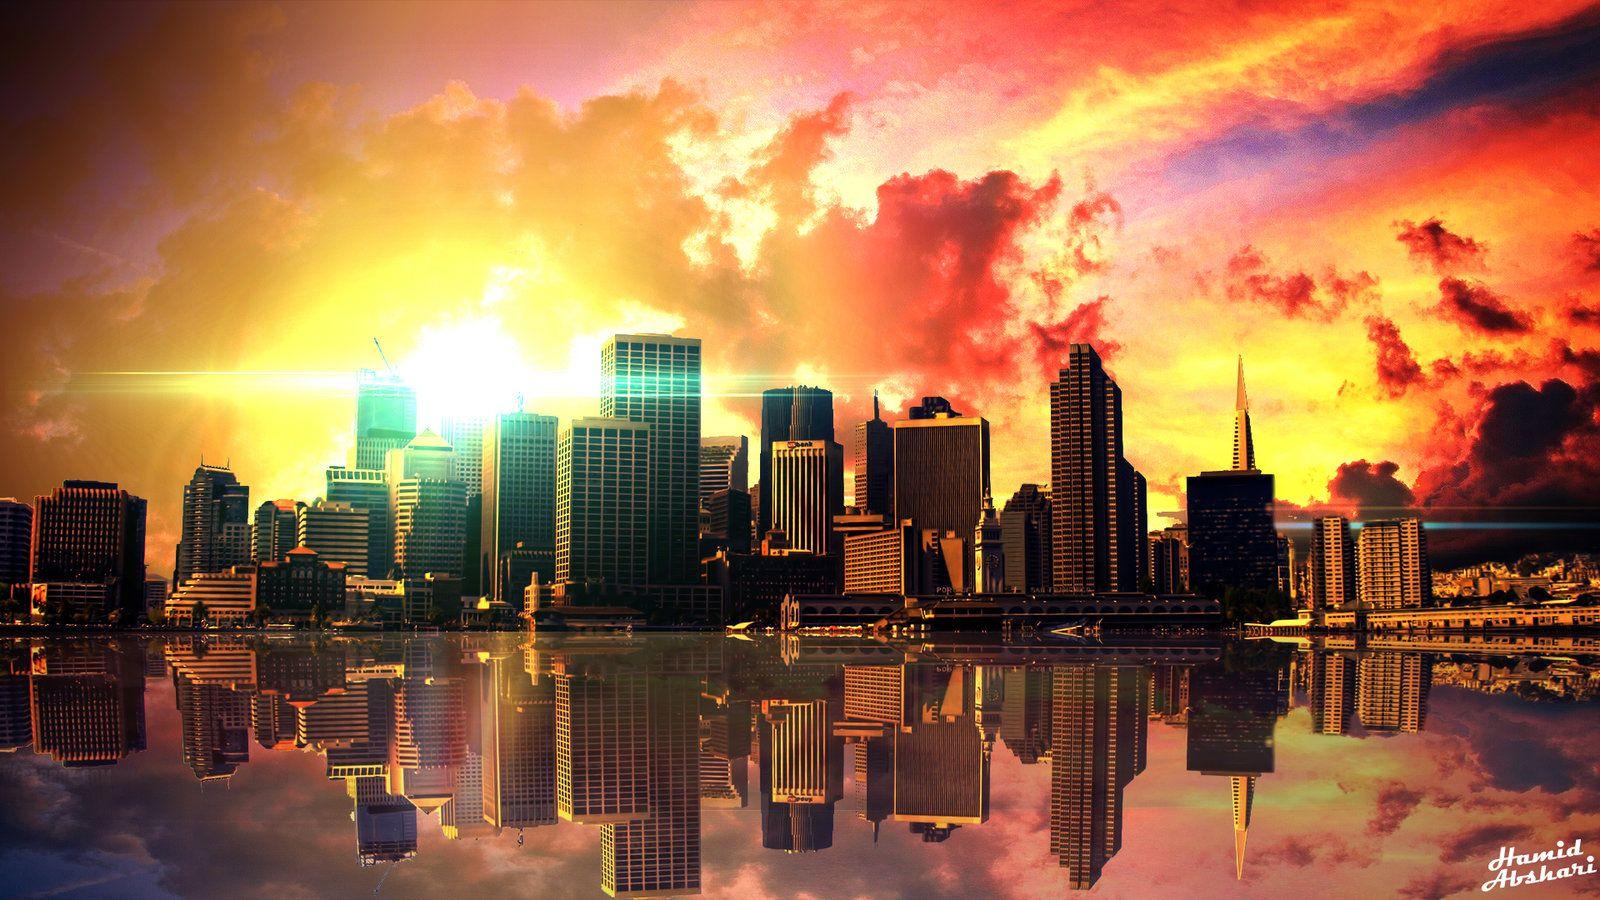 Sunset City Wallpaper HD Author Bylabz Sunset city